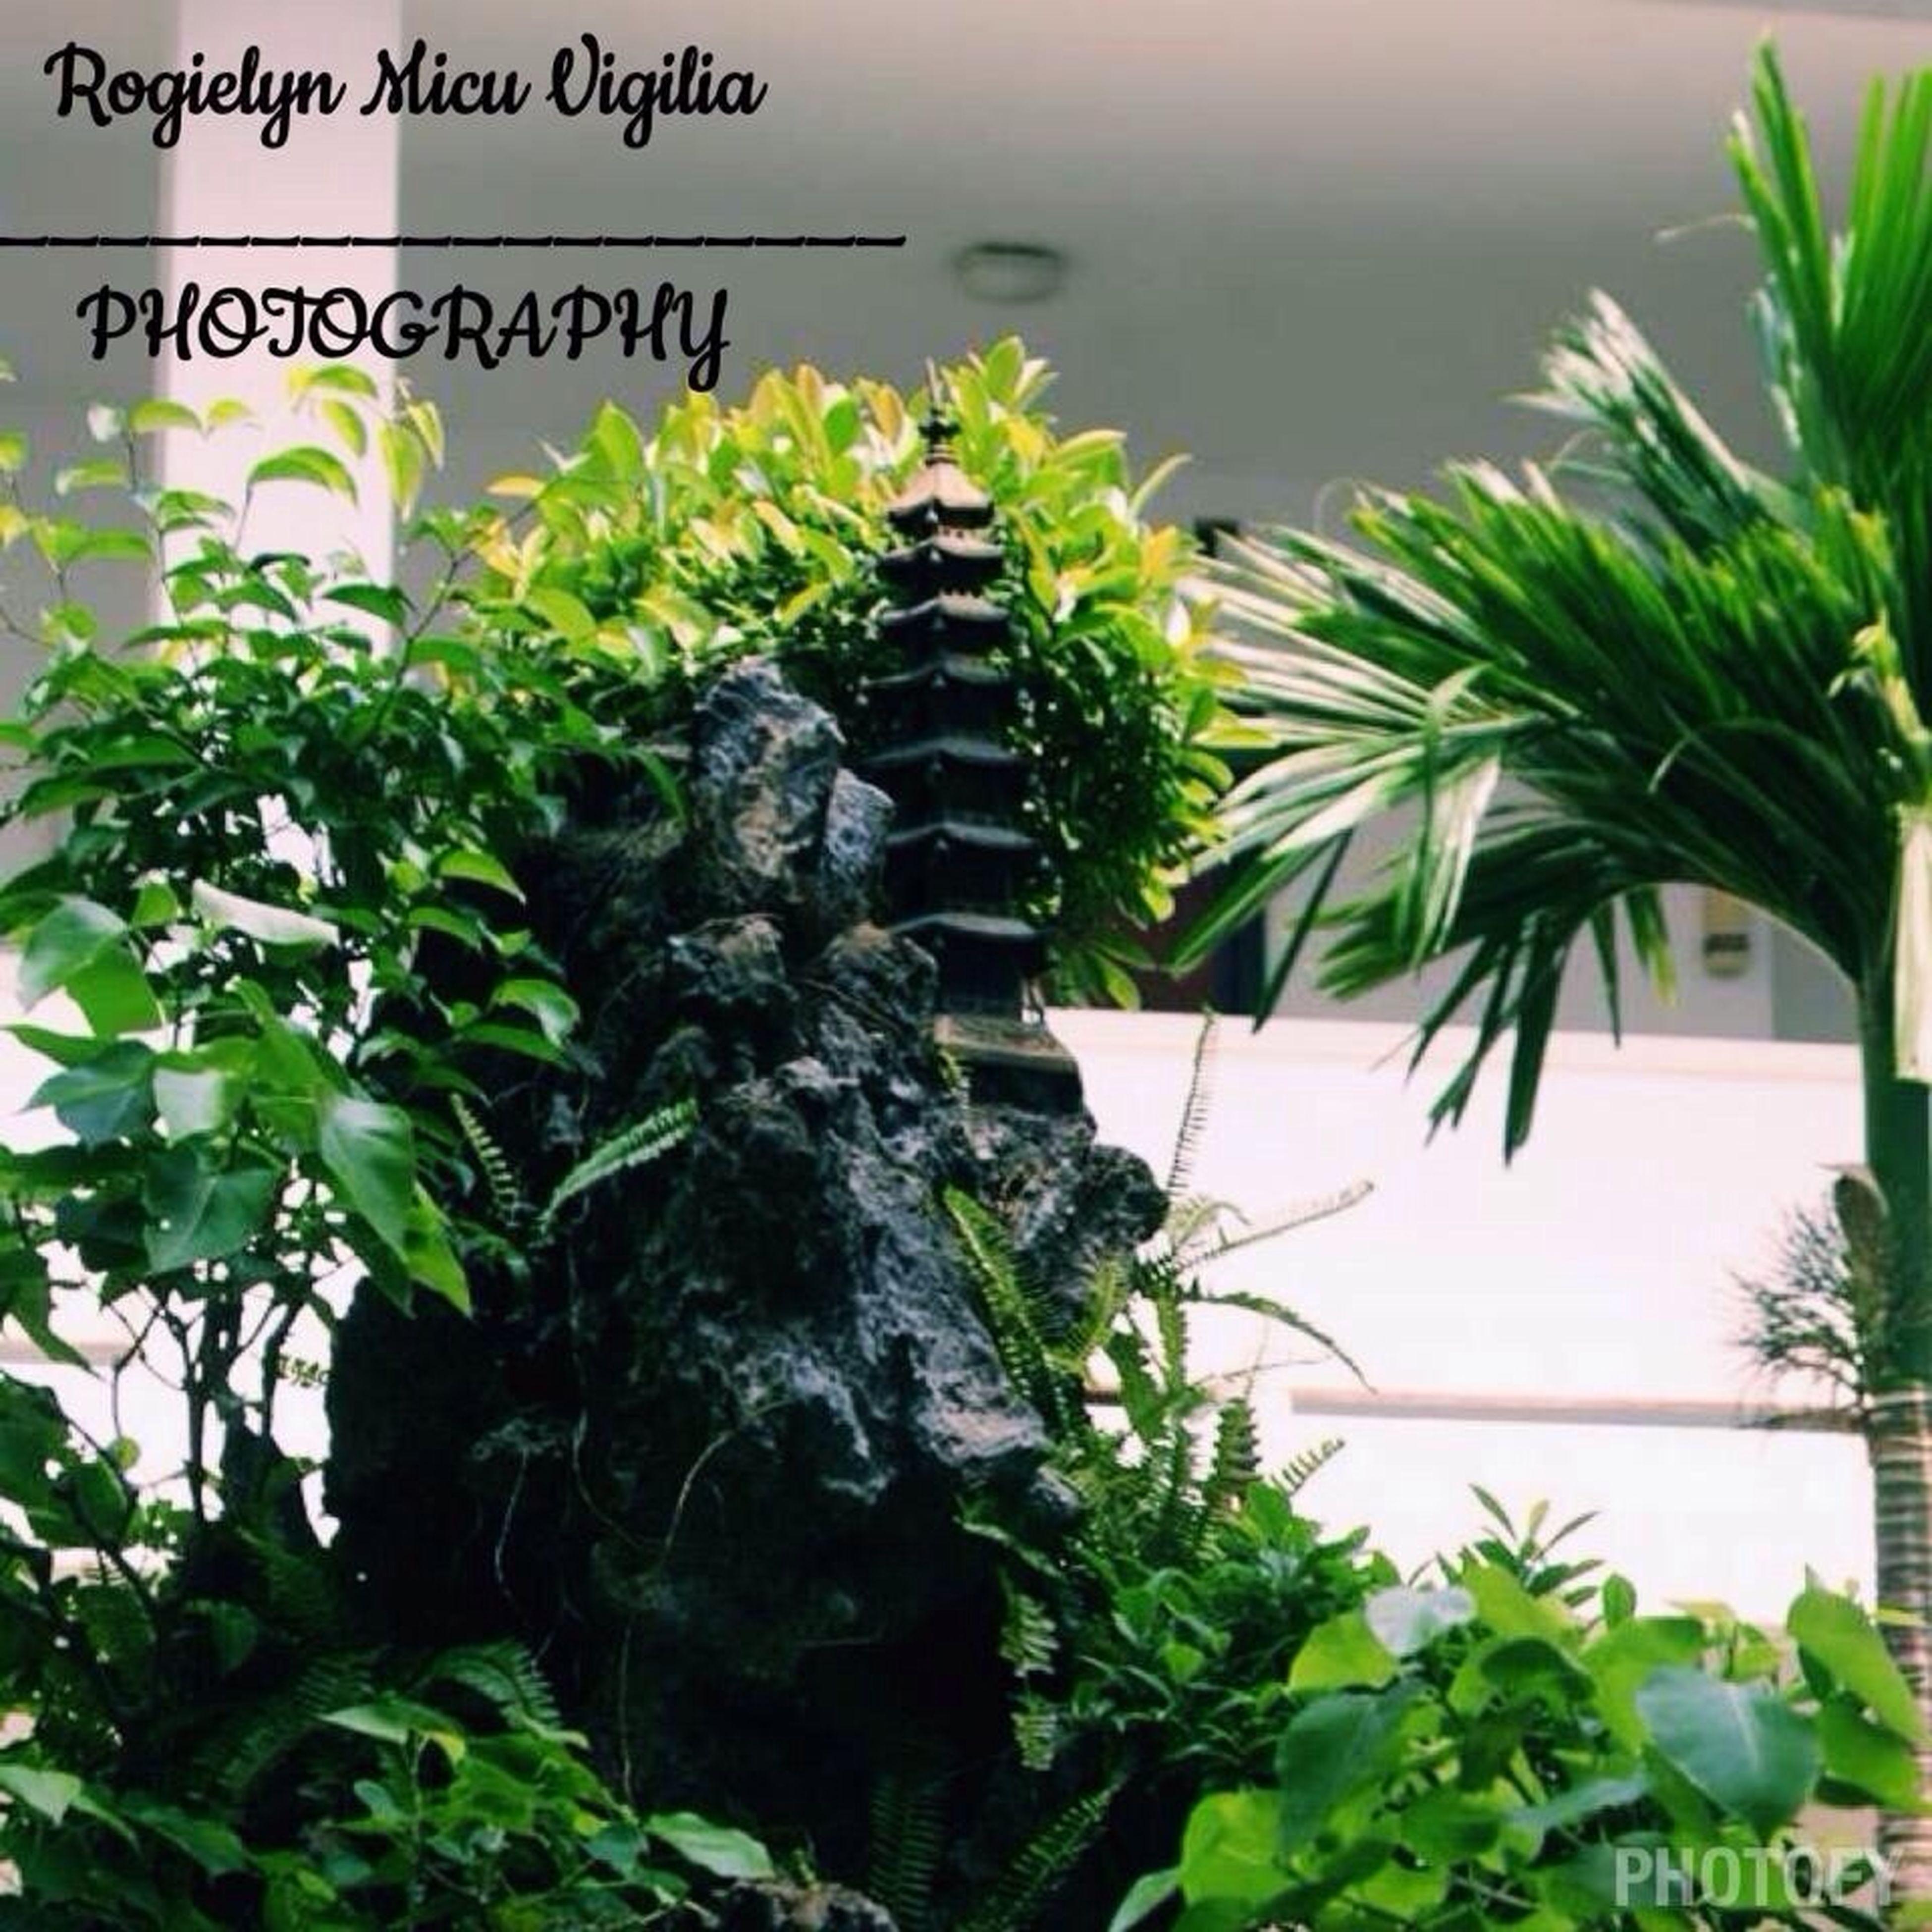 I love Photography